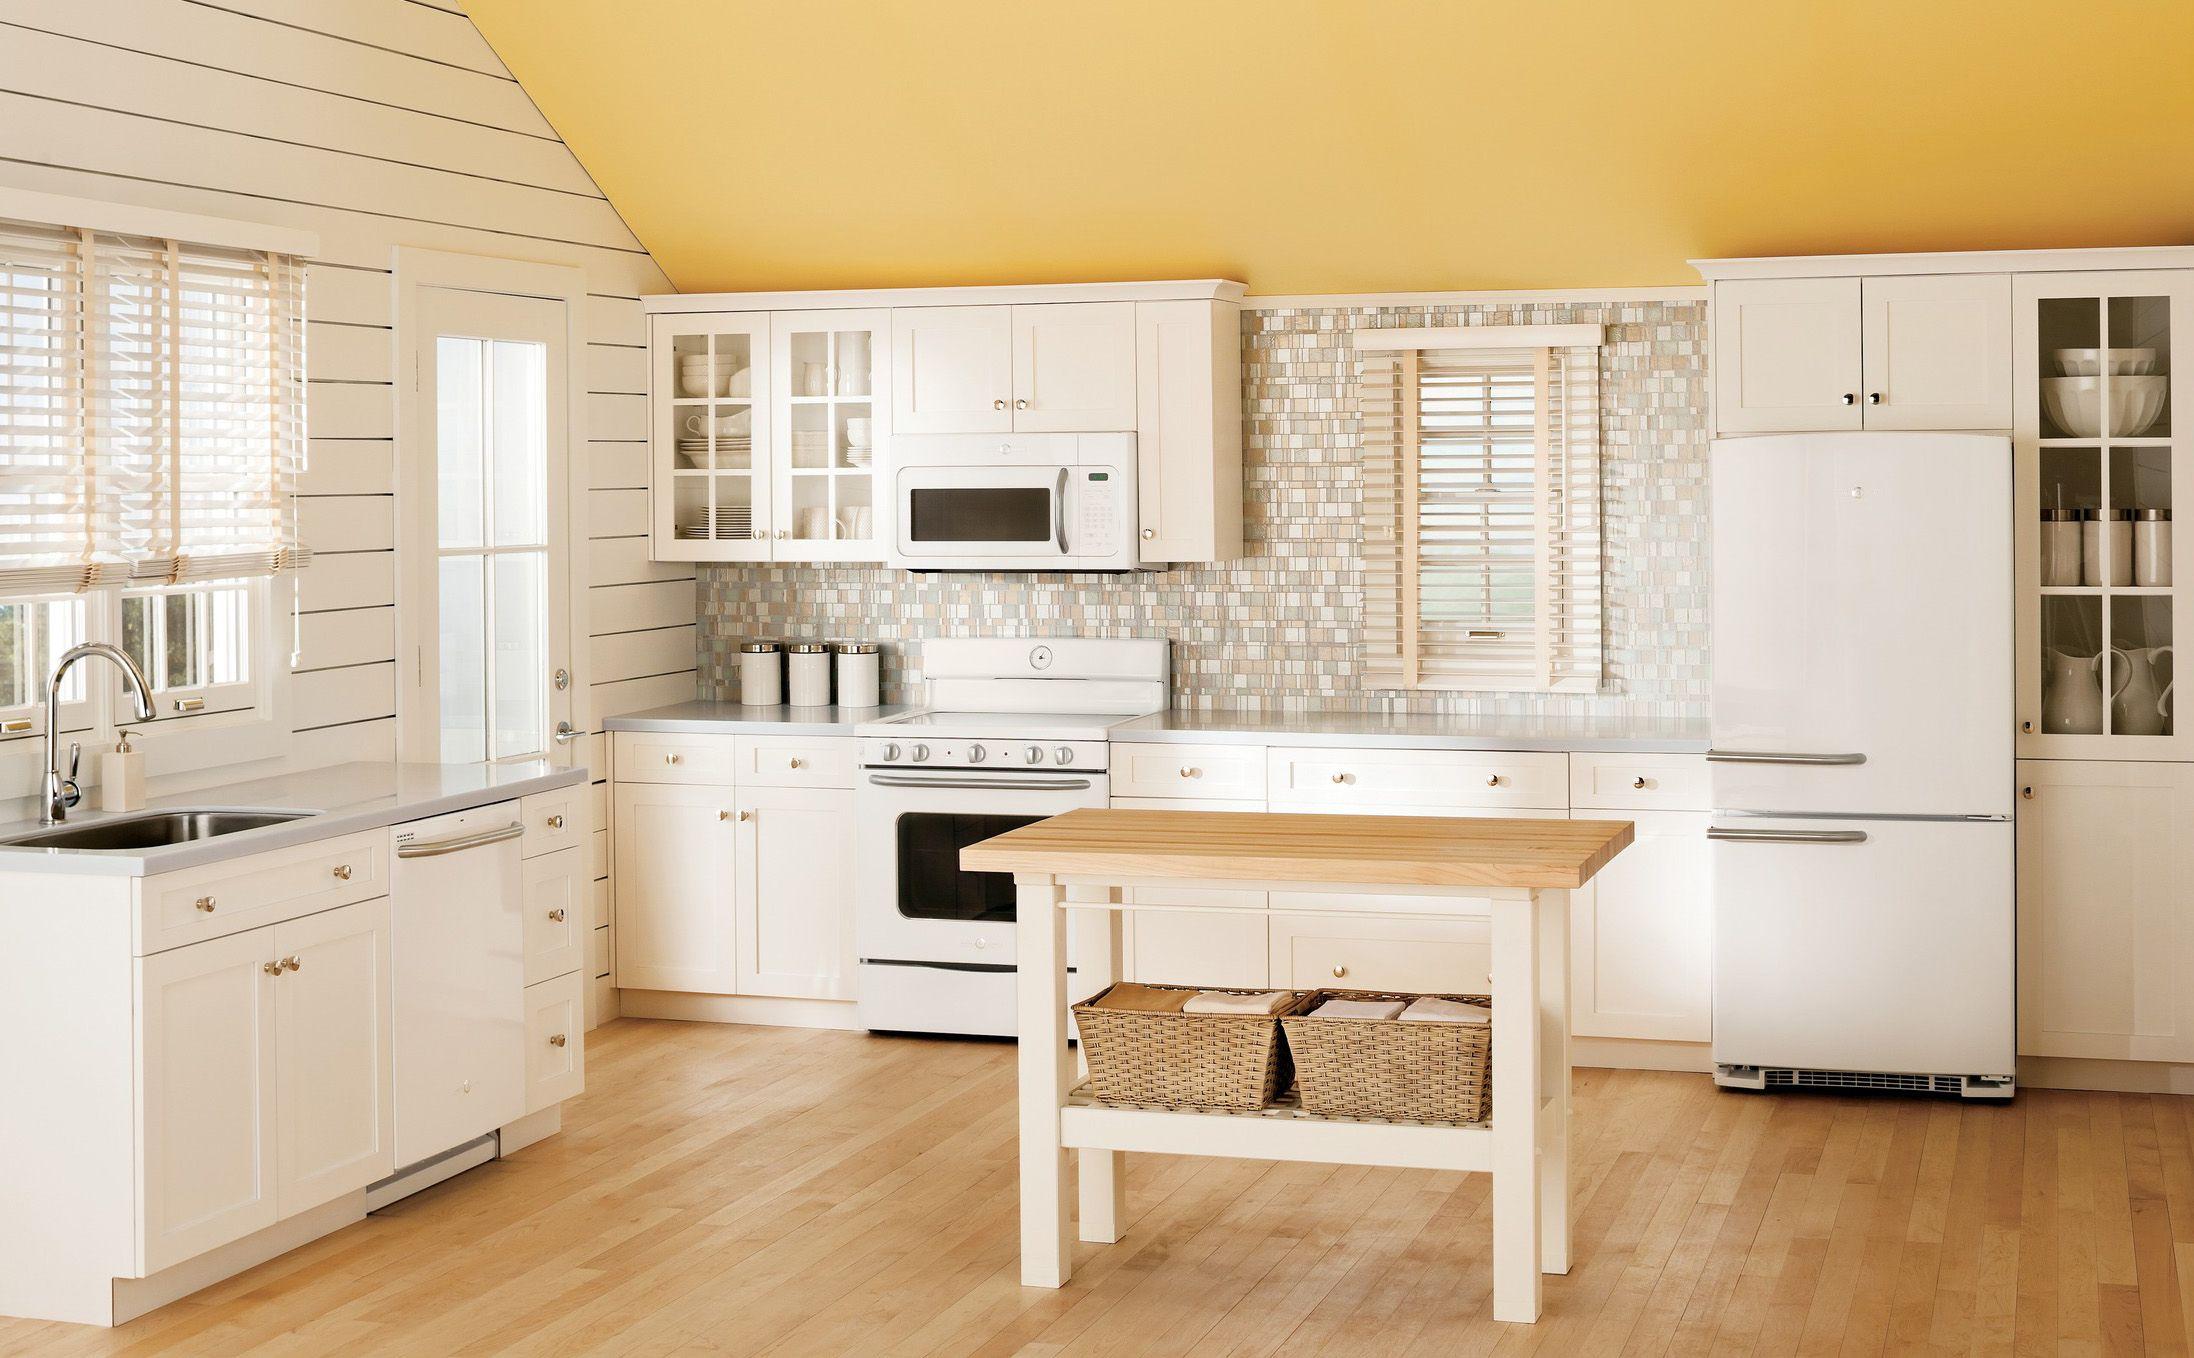 Retro Kitchen Photo featuring GE Artistry Kitchen Appliances | Home ...